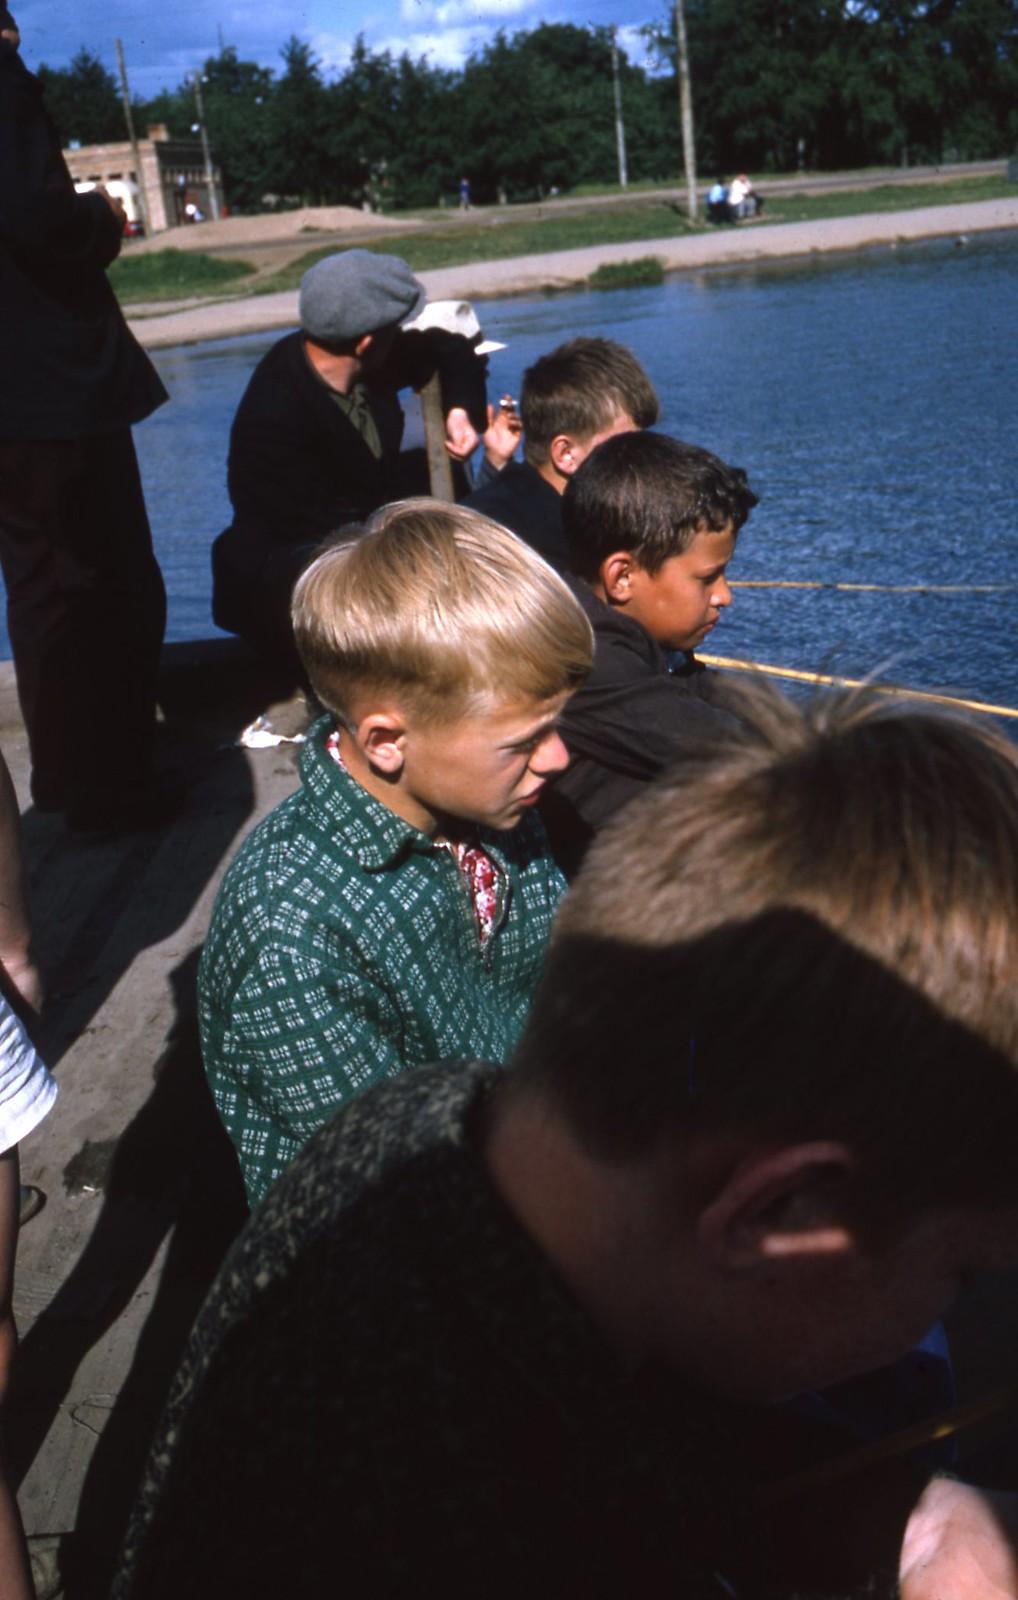 hammond-MA10-Ostankino-people-sunbathing-and-fishing-028